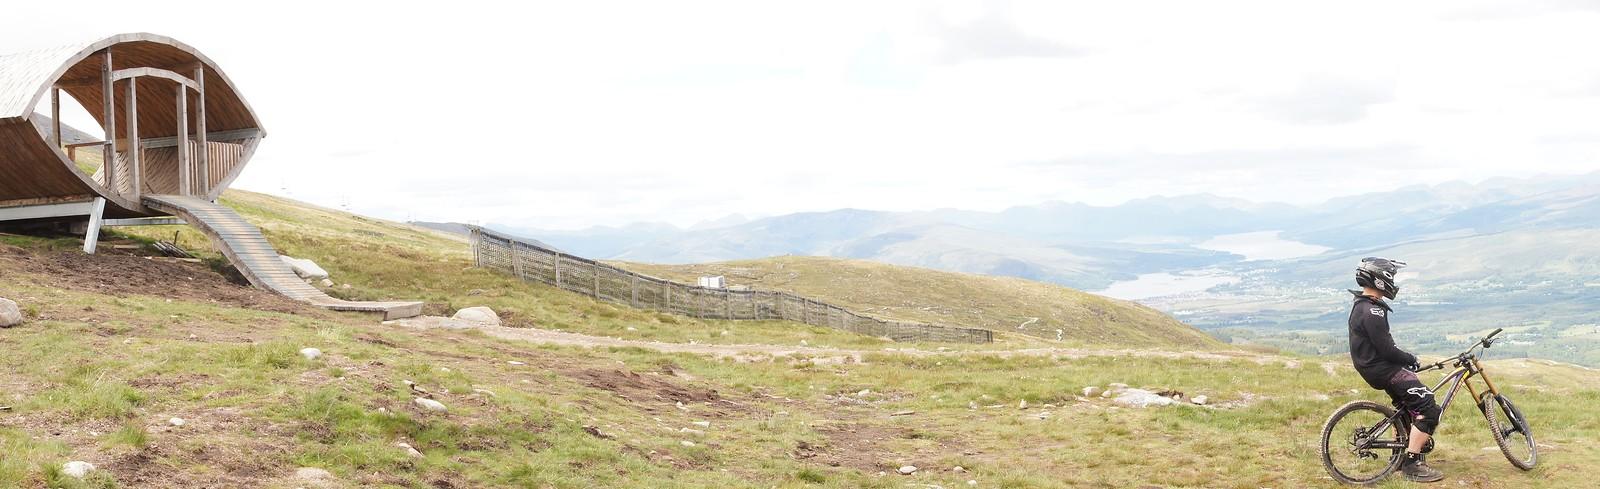 Fort William Lone Rider - Fodfotos - Mountain Biking Pictures - Vital MTB